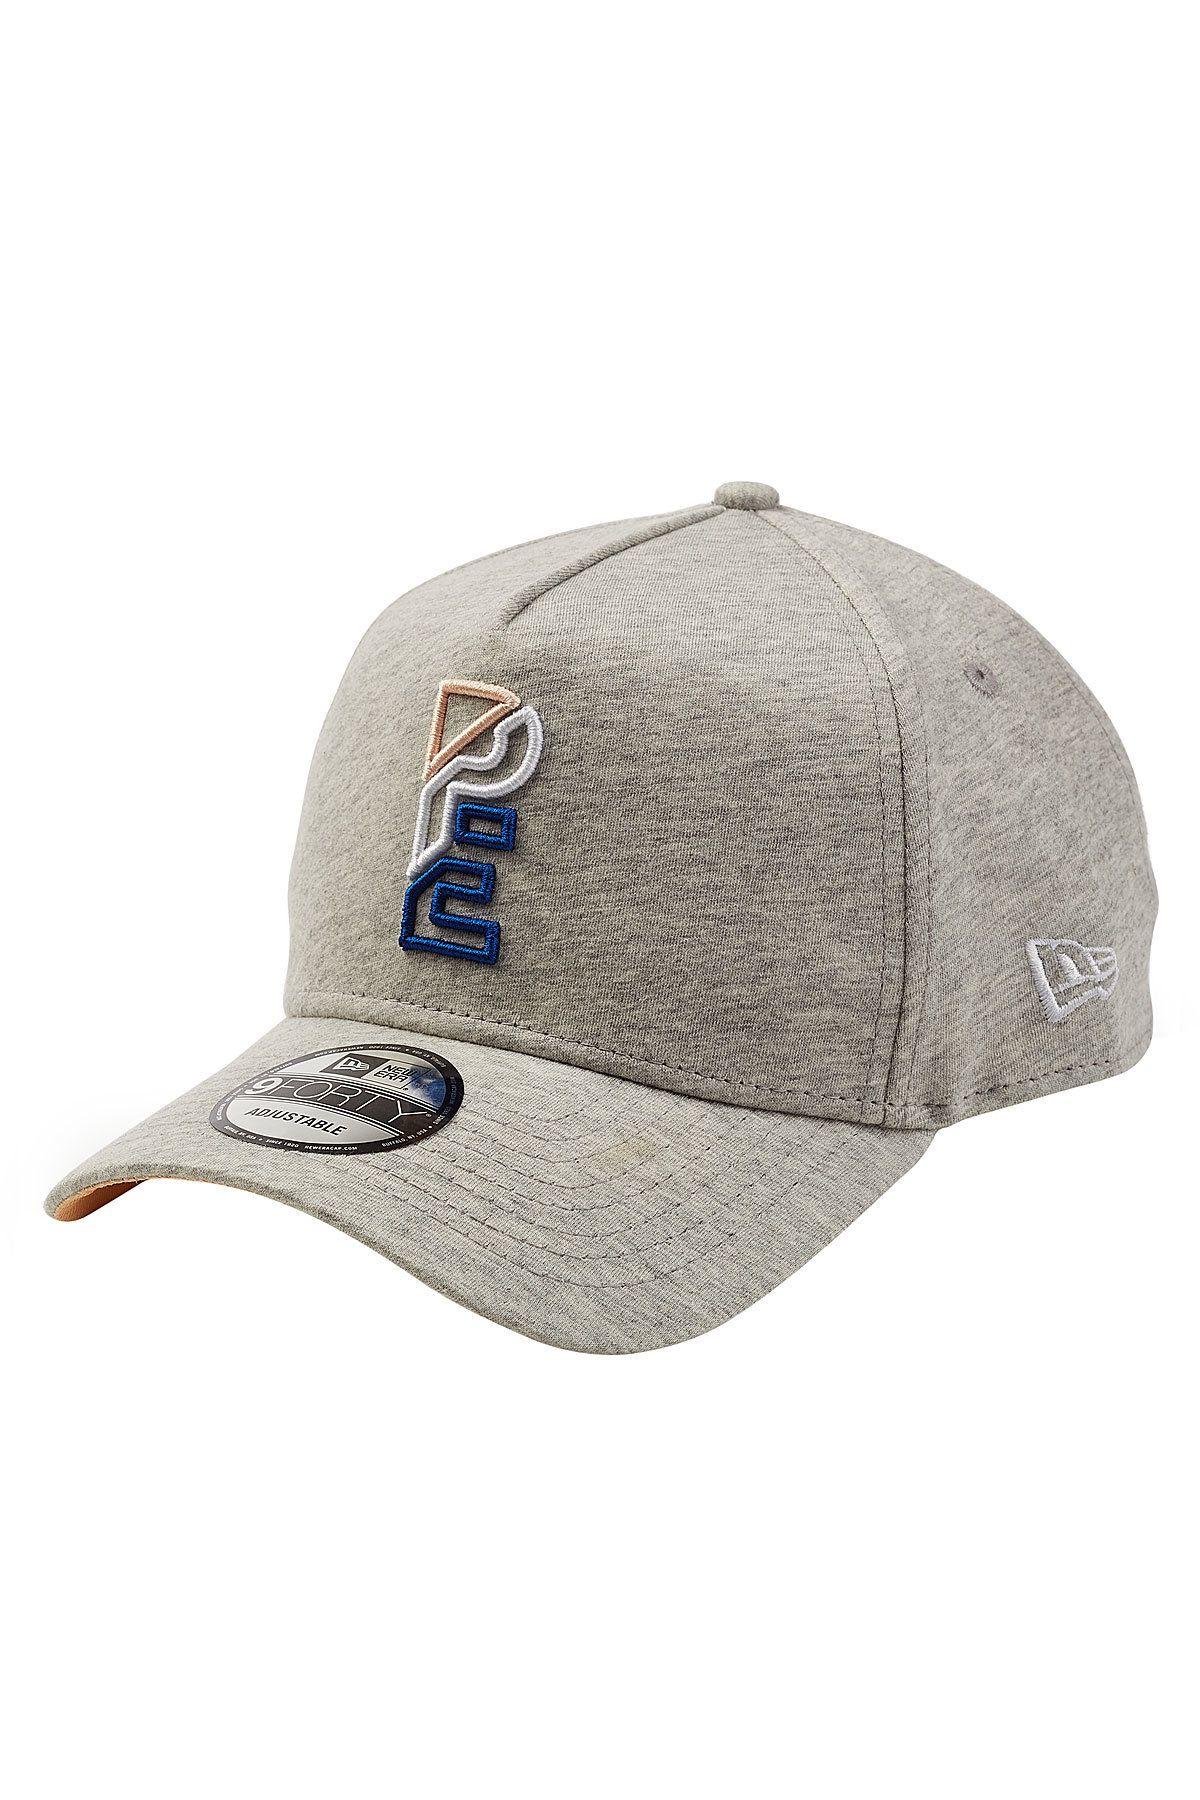 The P E Era Baseball Cap In Grey